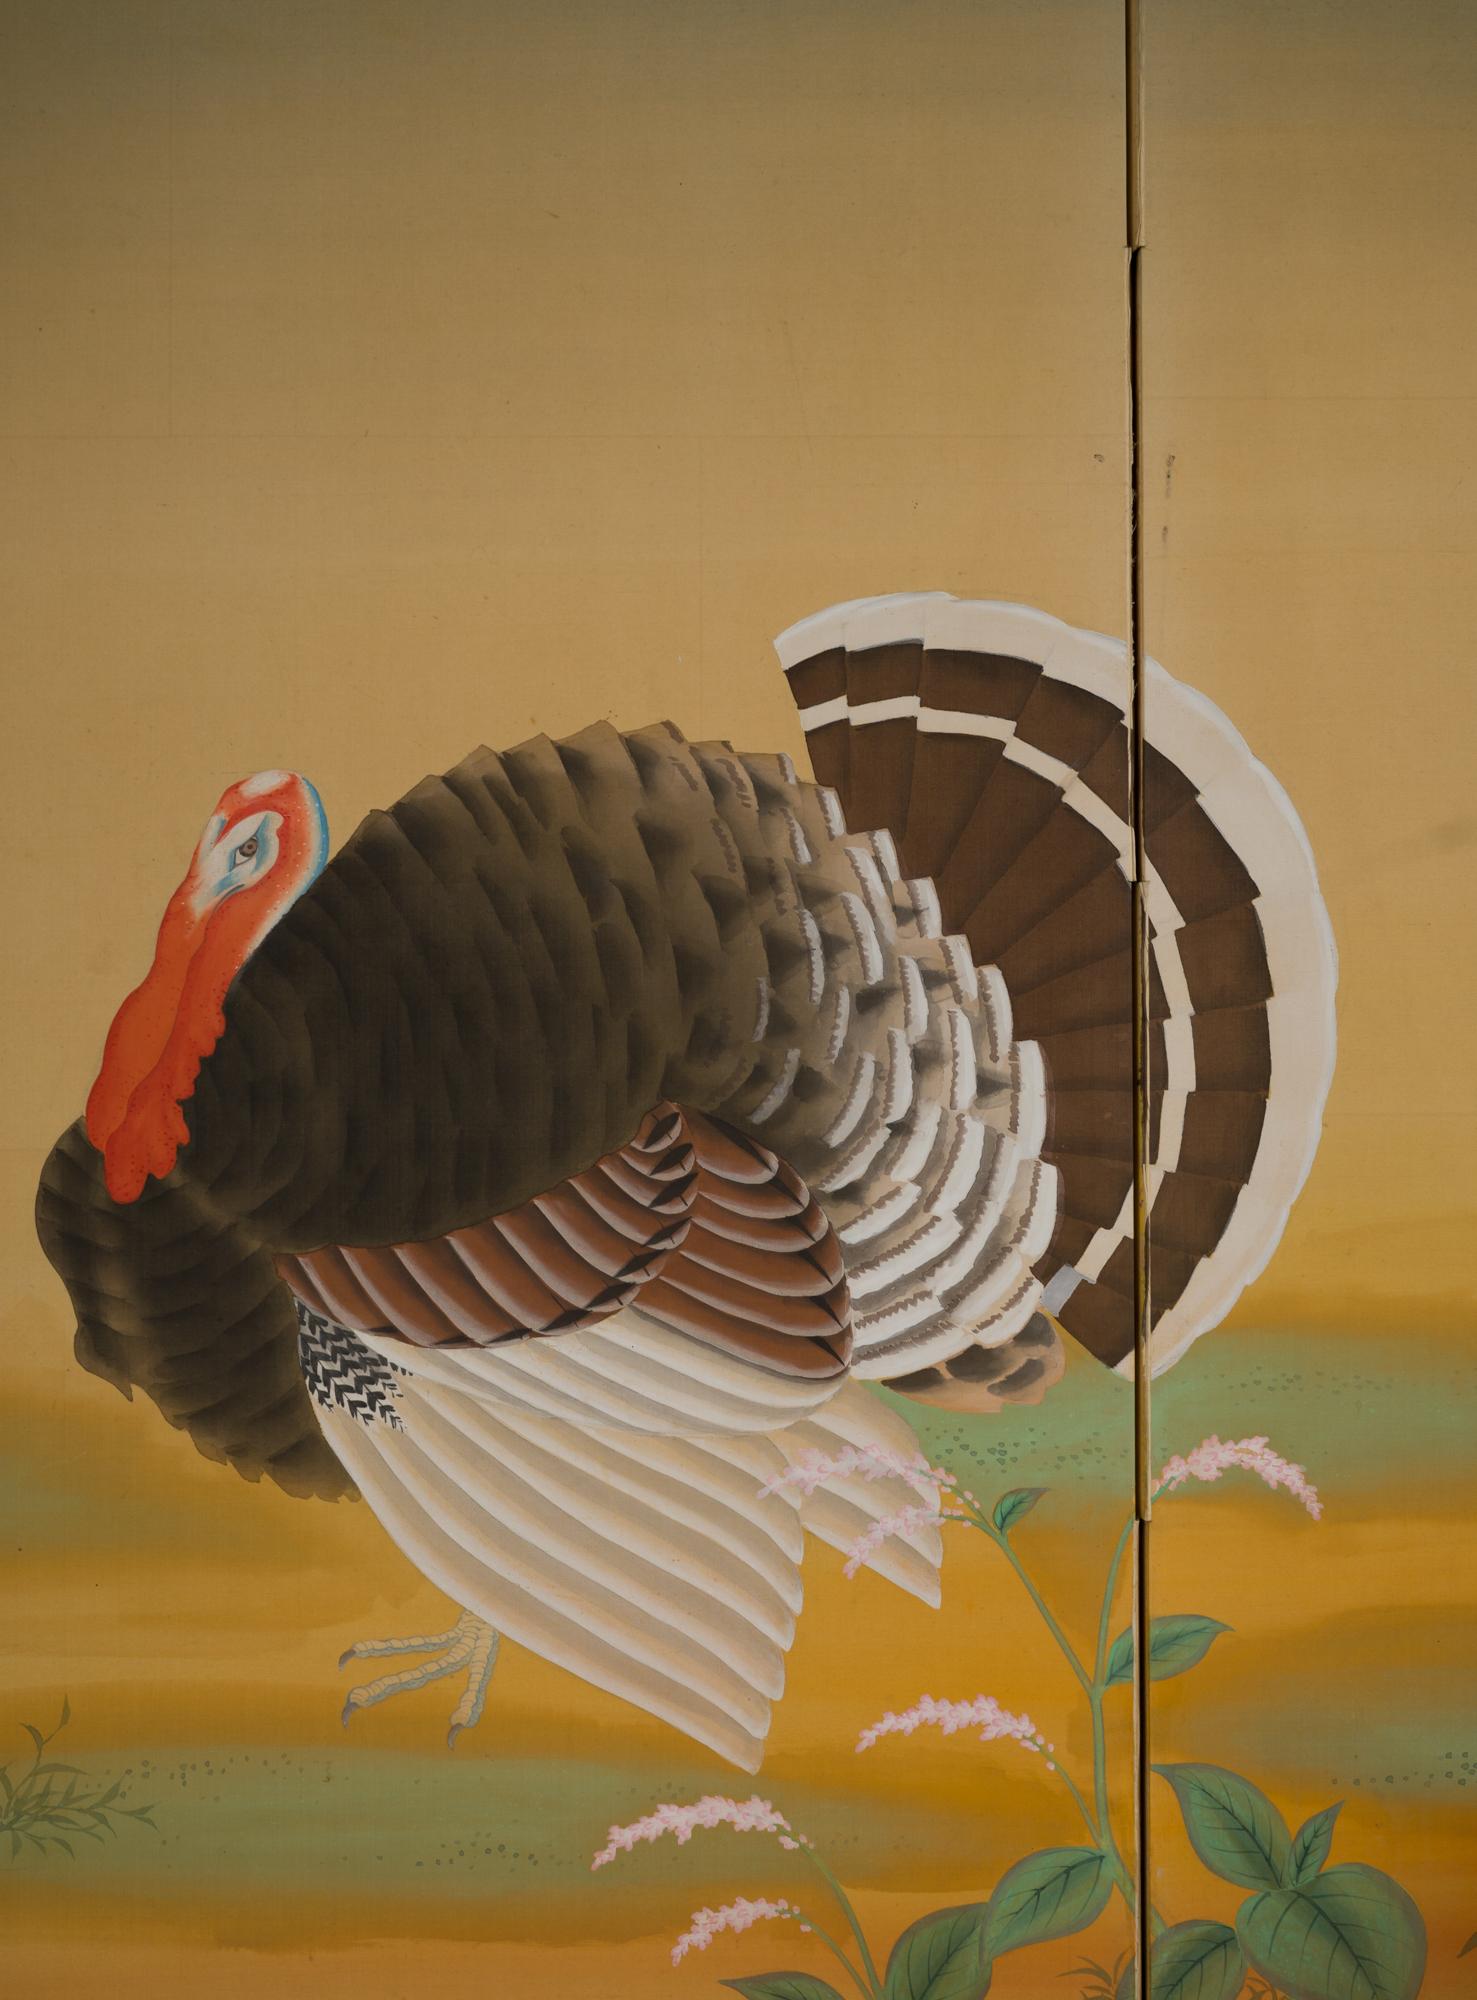 Japanese Two Panel Screen: Turkeys